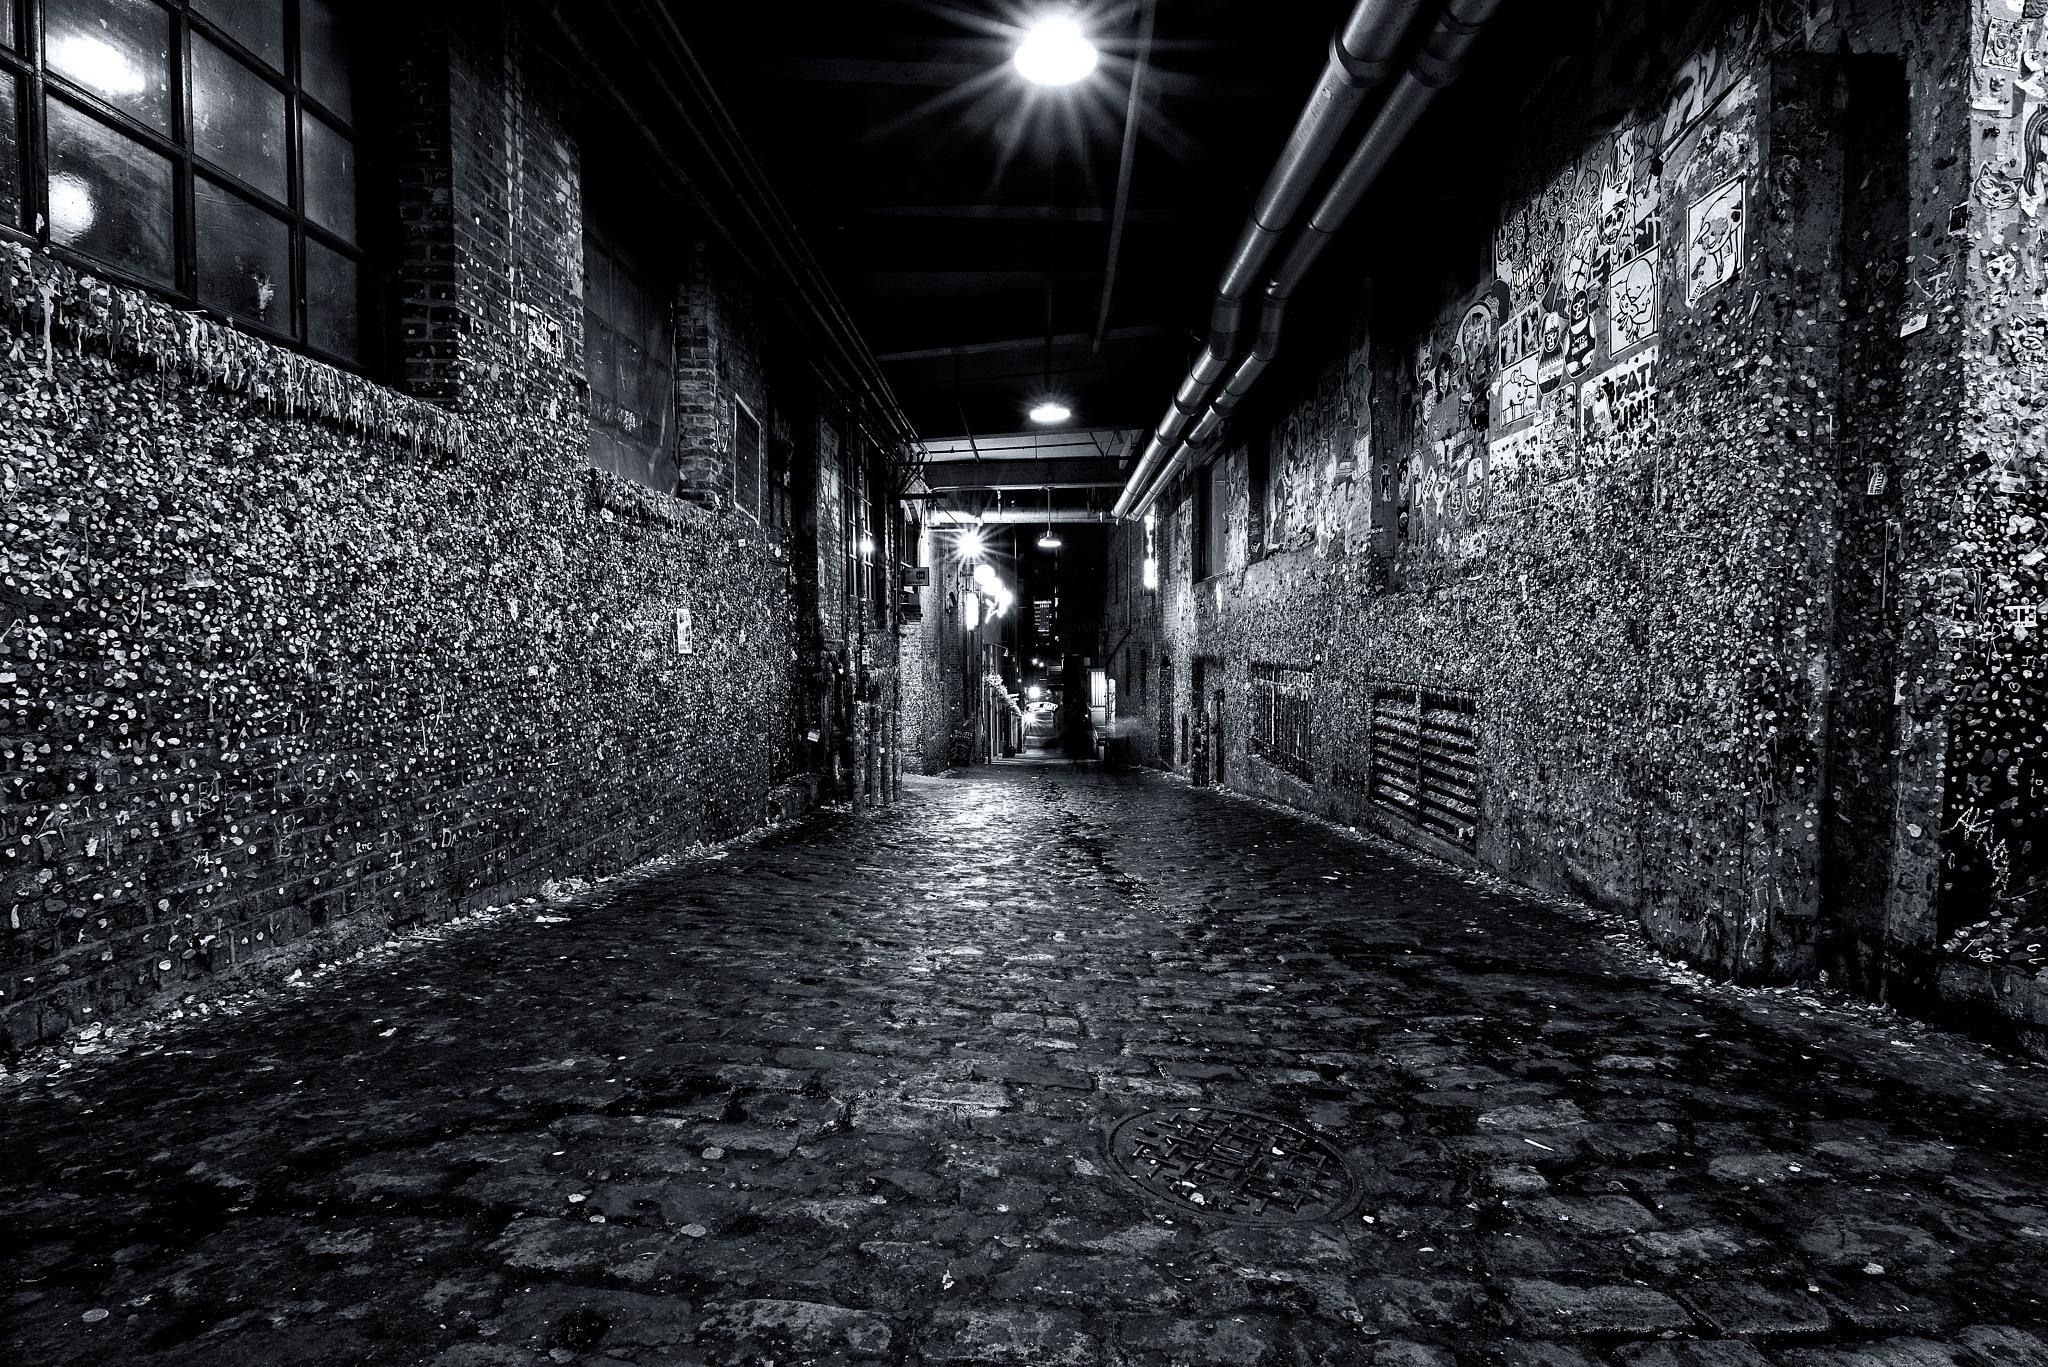 Seattle gum wall by michael Chervenak